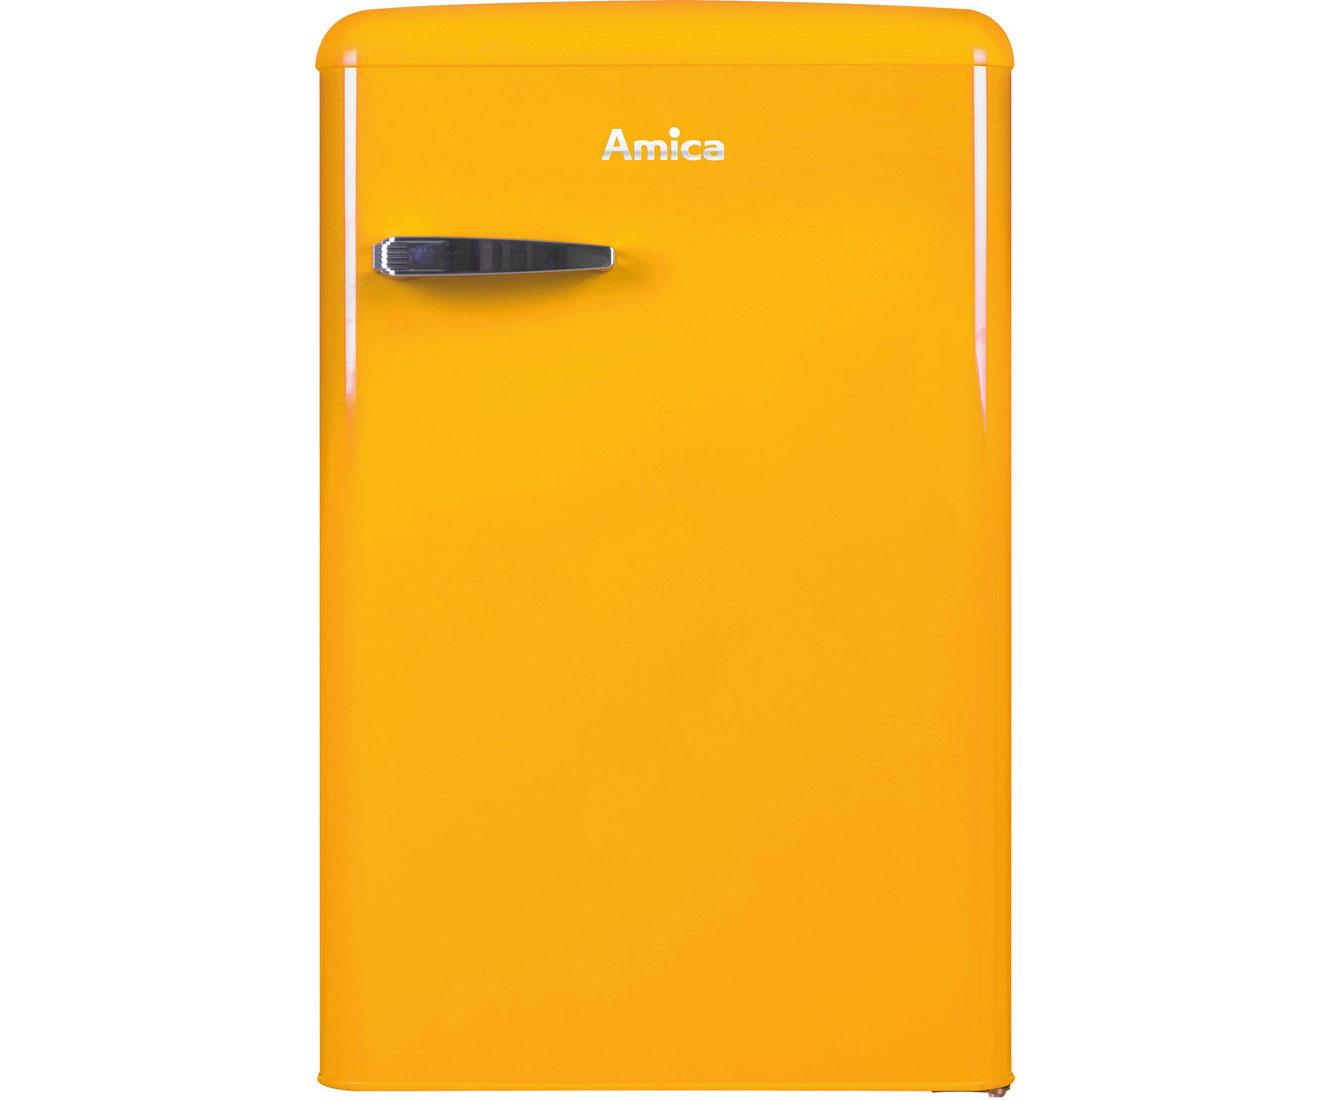 Amica Retro Kühlschrank Test : Amica retro kühlschrank test: standkühlschränke test ▷ bestenliste